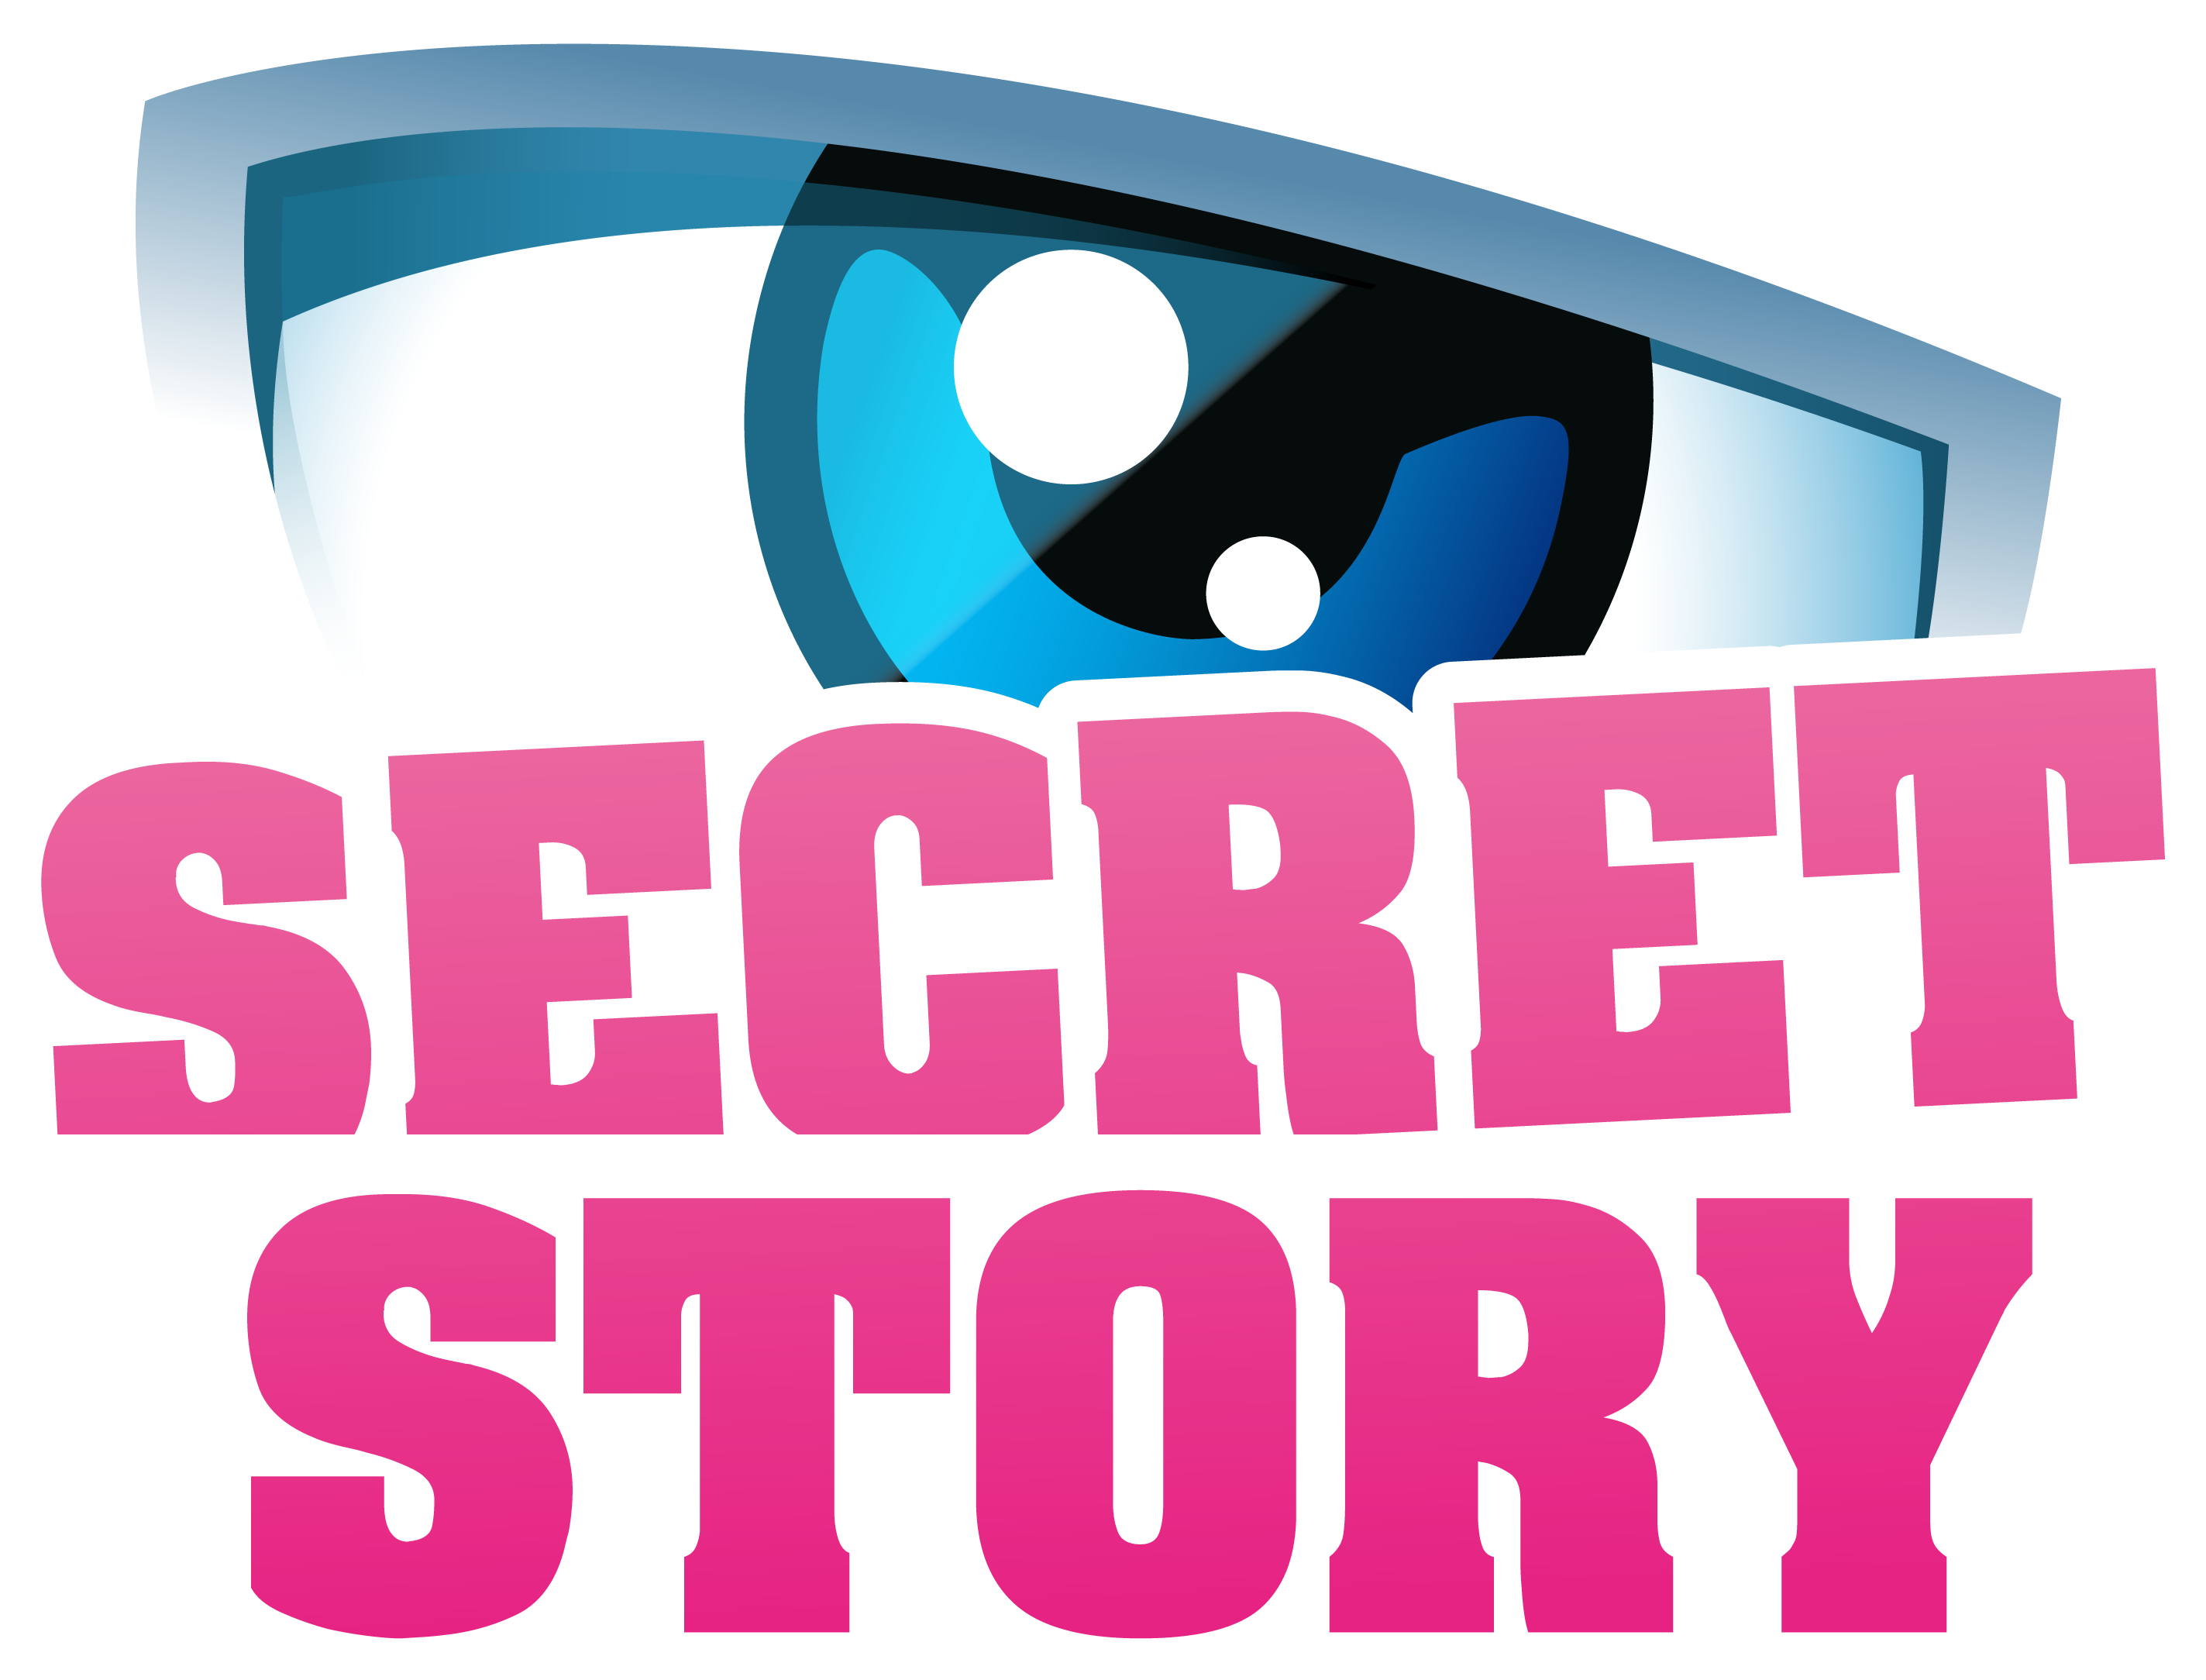 http://cyril.bourreau.free.fr/Vectoriel/Logo-Secretstory-version1.png